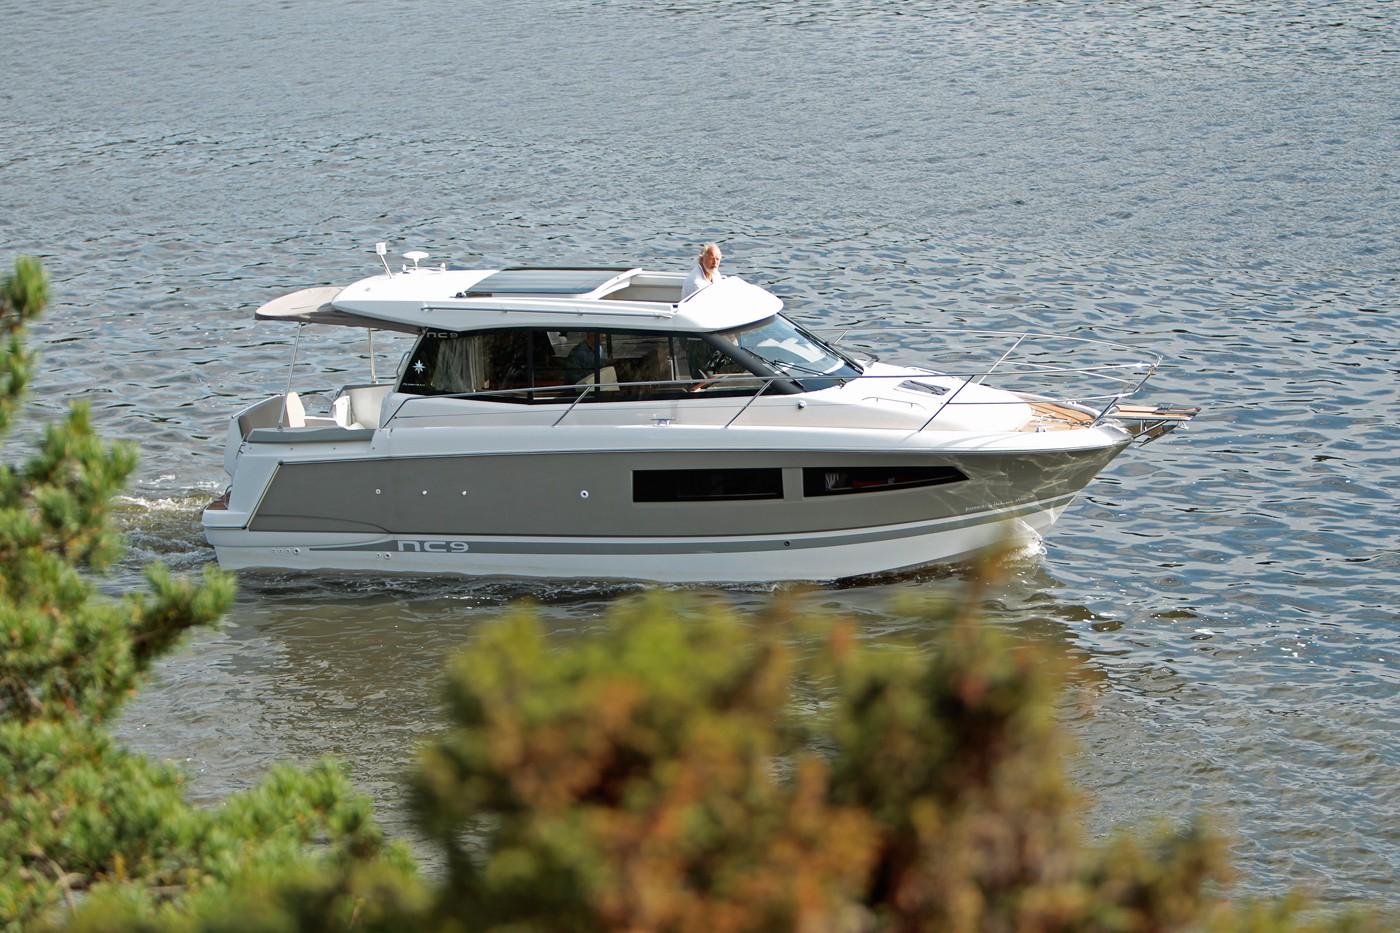 Jeanneau NC 9 Diesel - starboard side